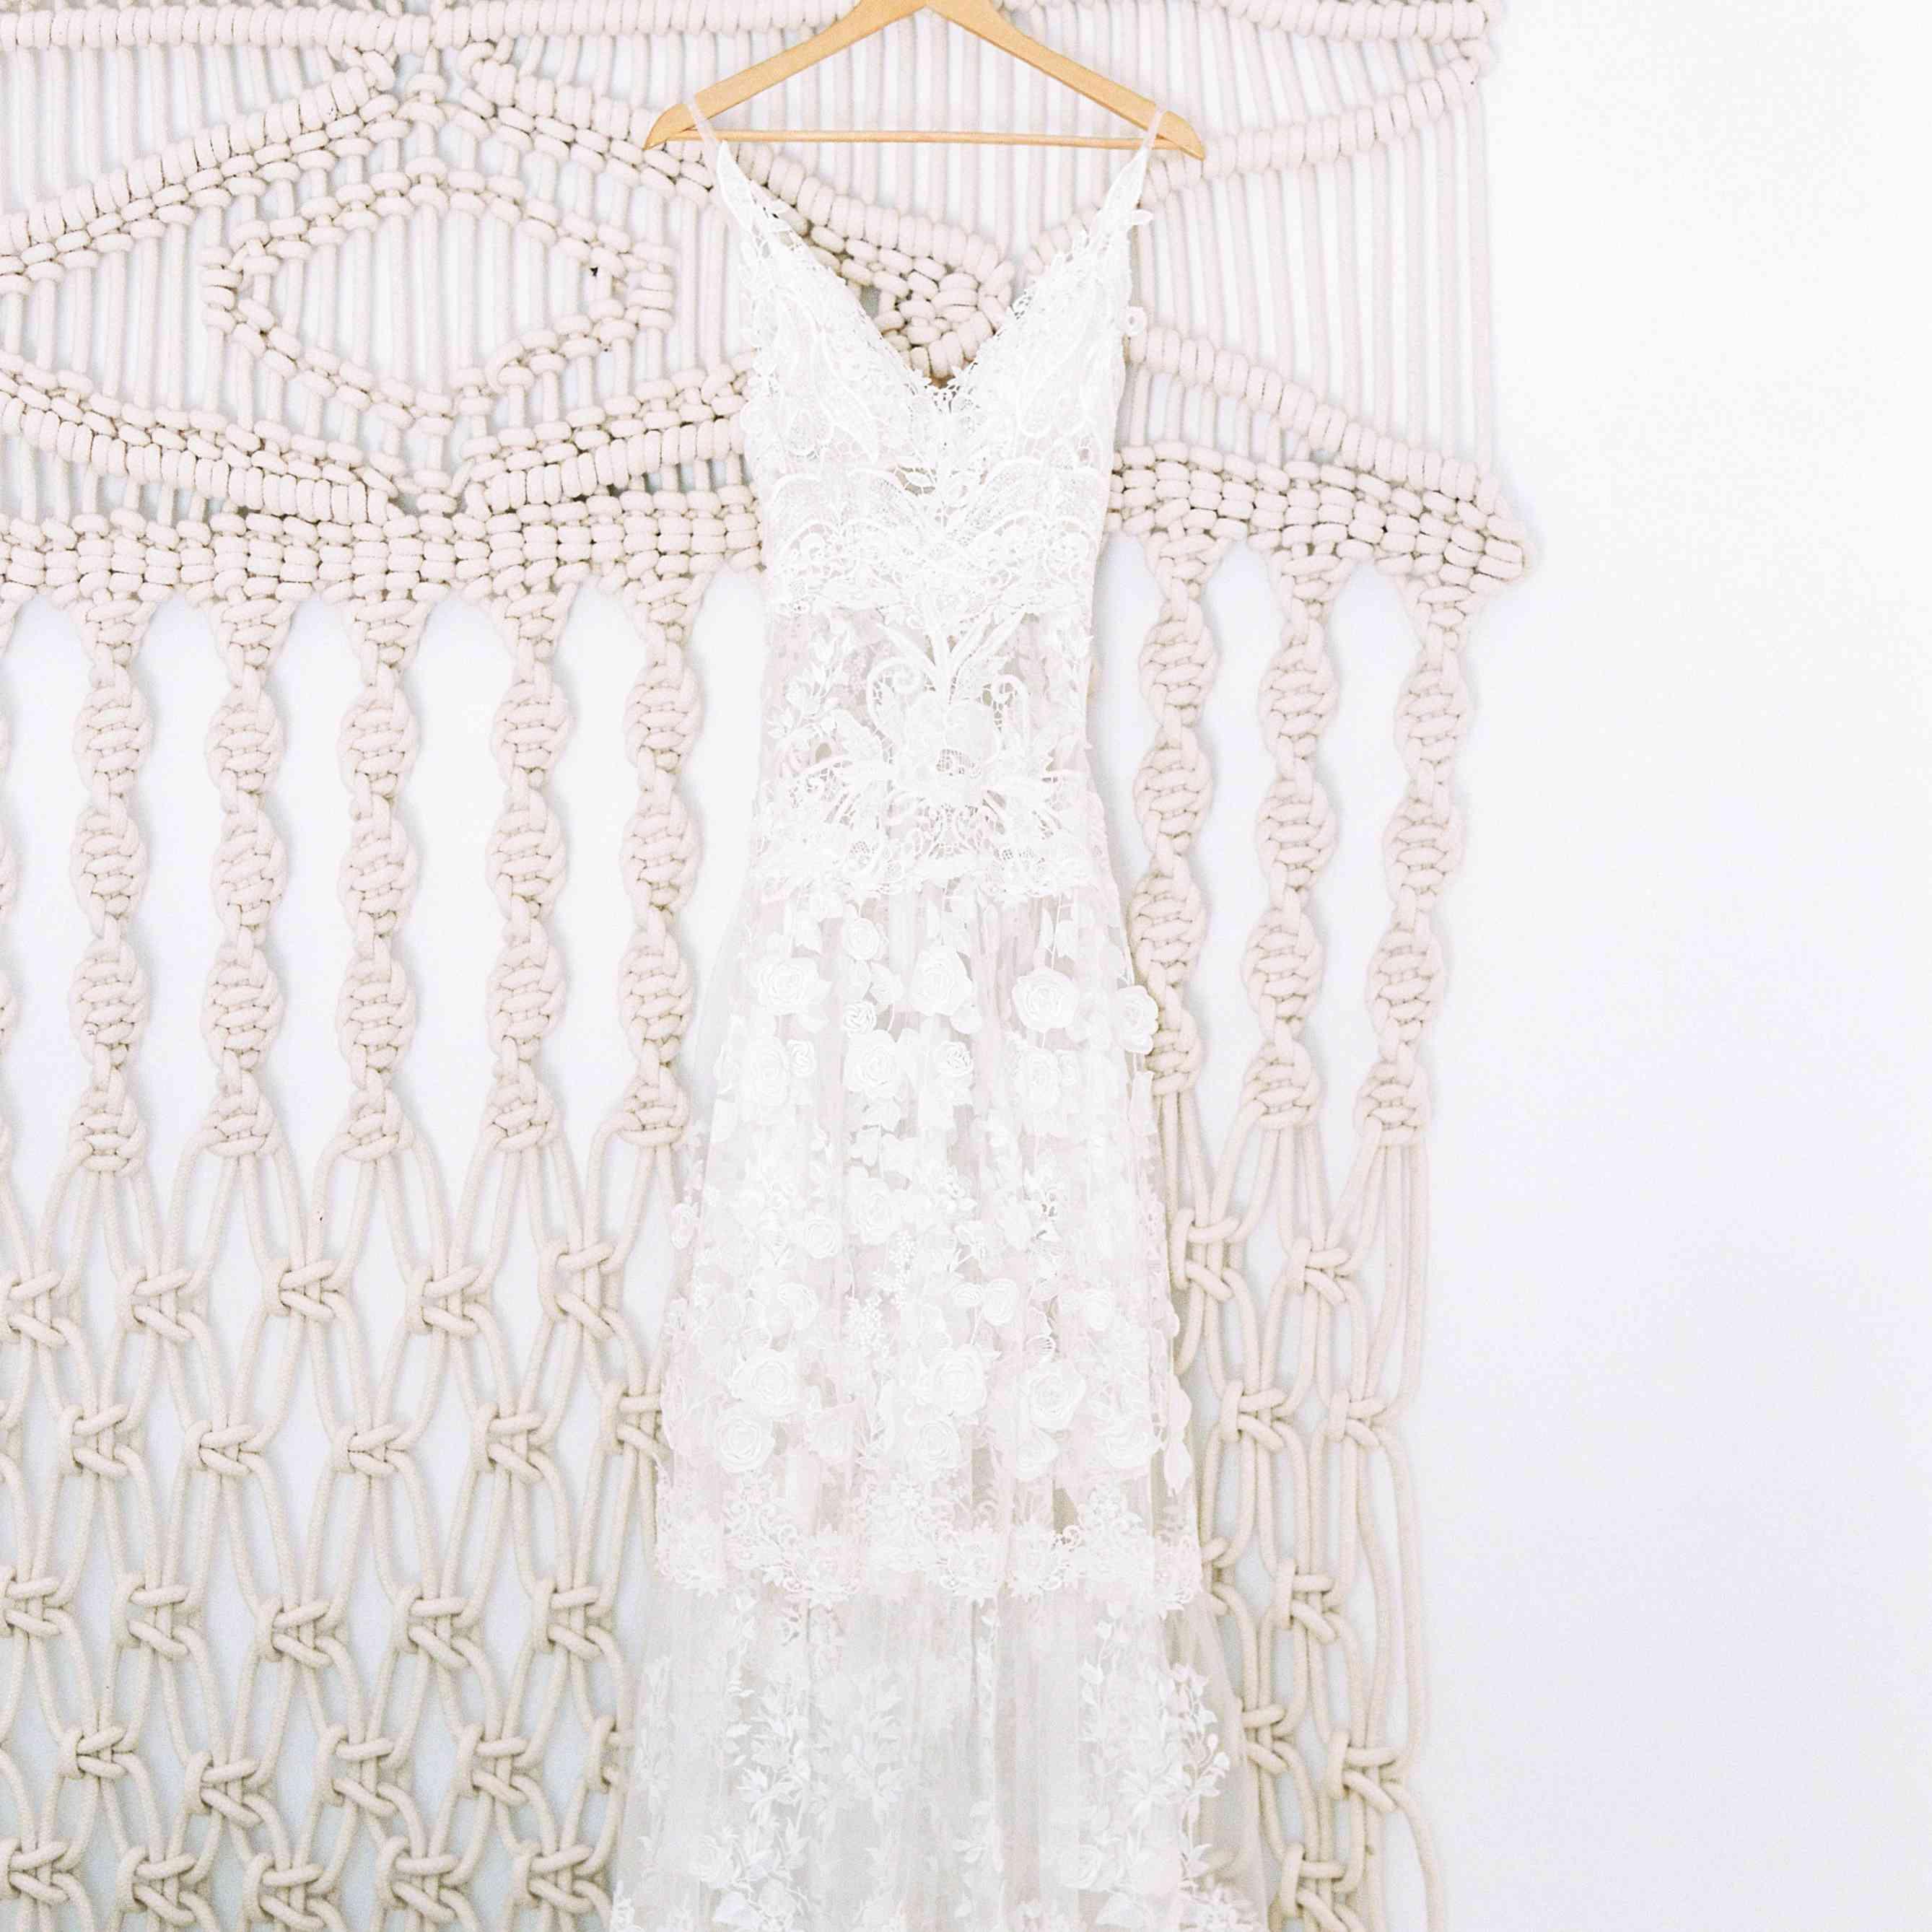 Hanging bride's dress macrame